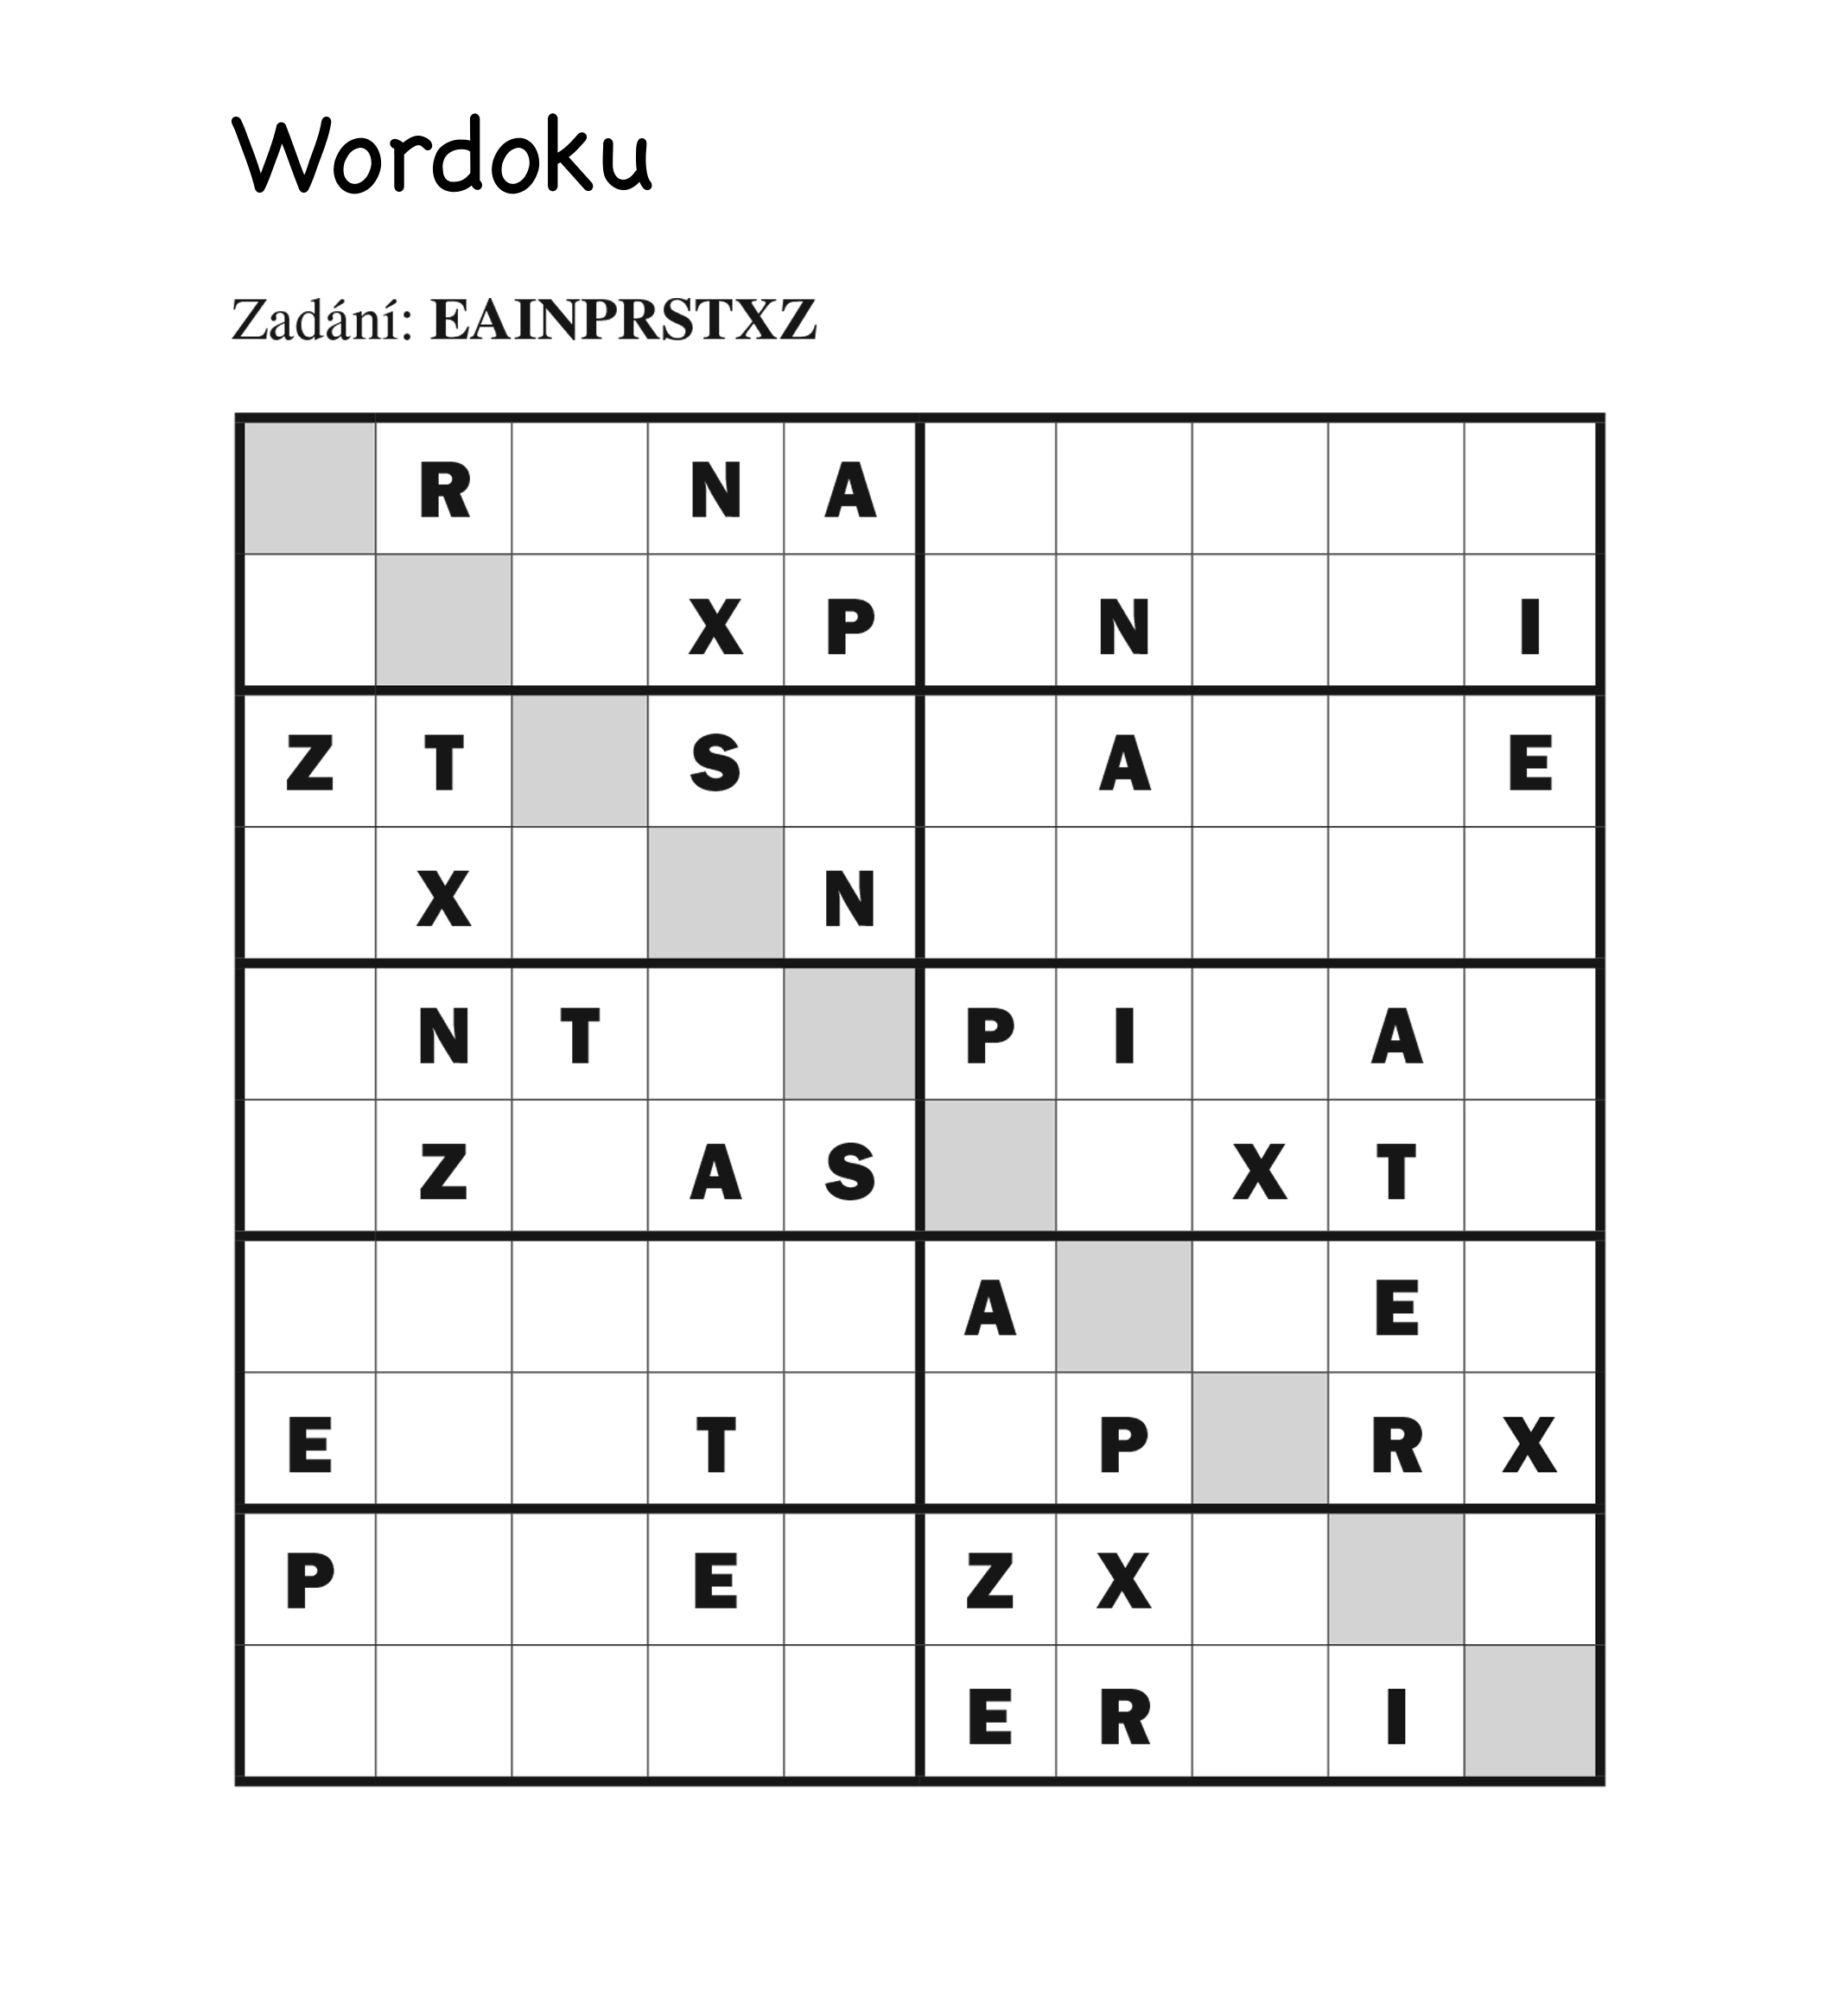 Wordoku Turpress